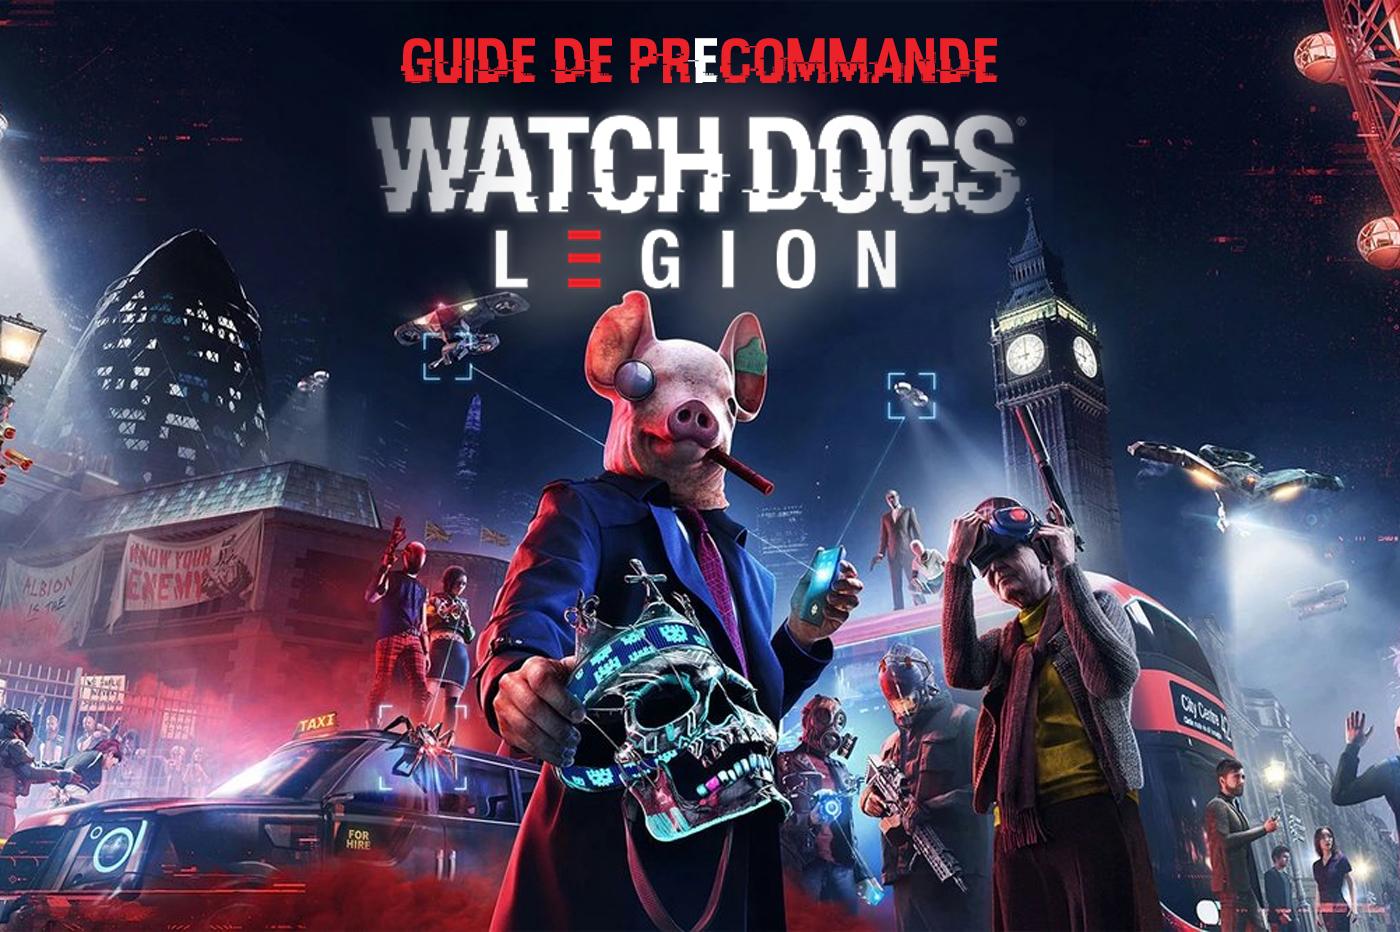 Guide de précommande Watch Dogs Legion